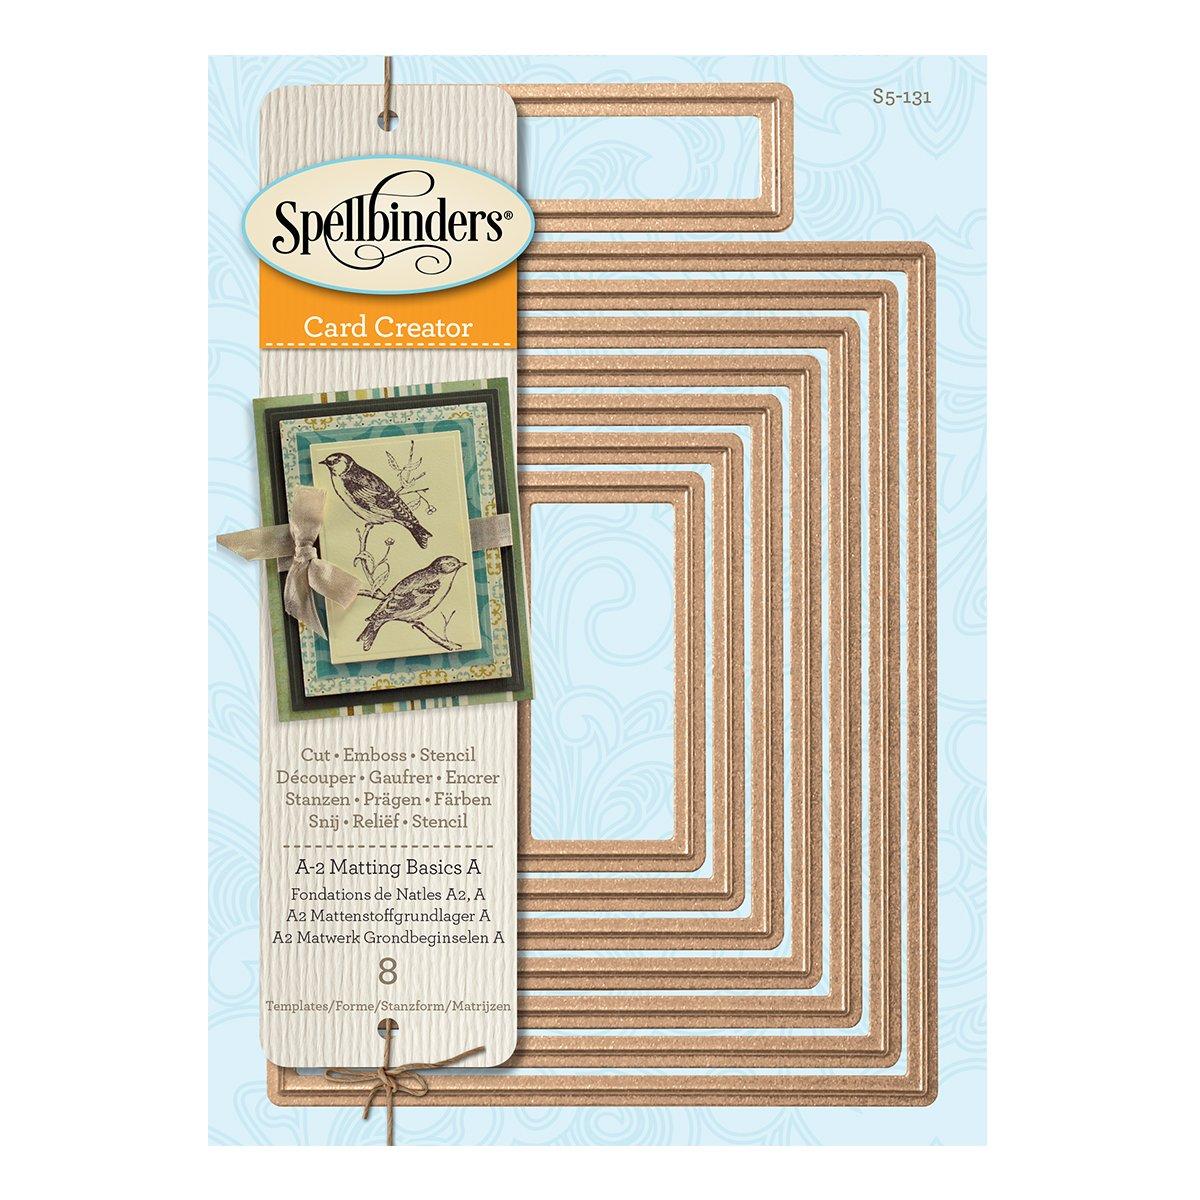 Spellbinders S5-131 Nestabilities Card Creator A-2 Matting Basics A Die Templates